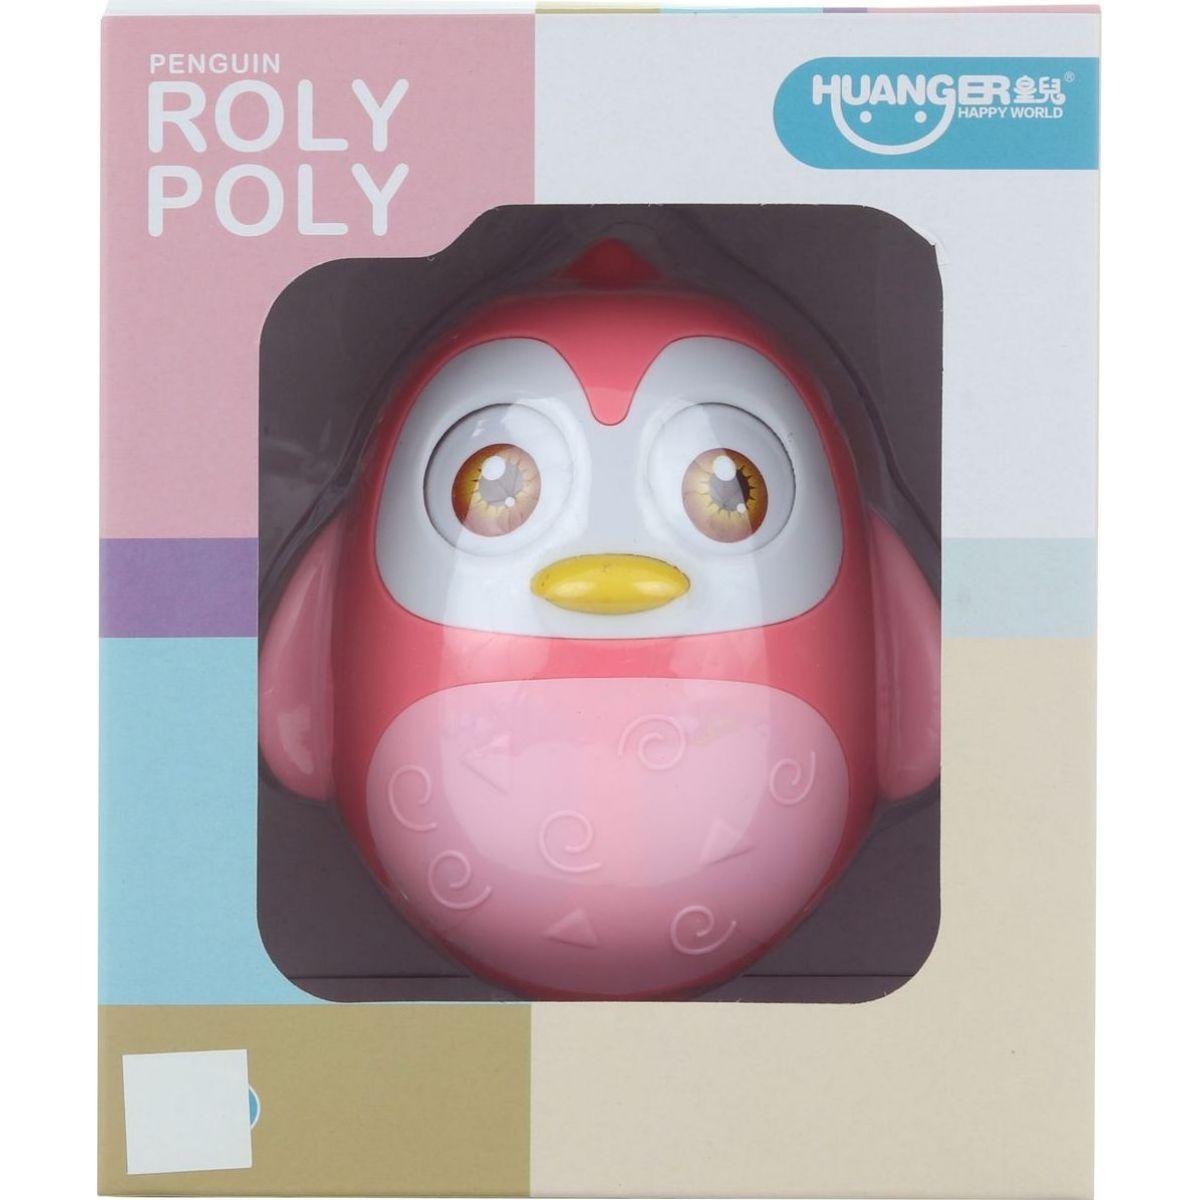 Rolly-polly růžové